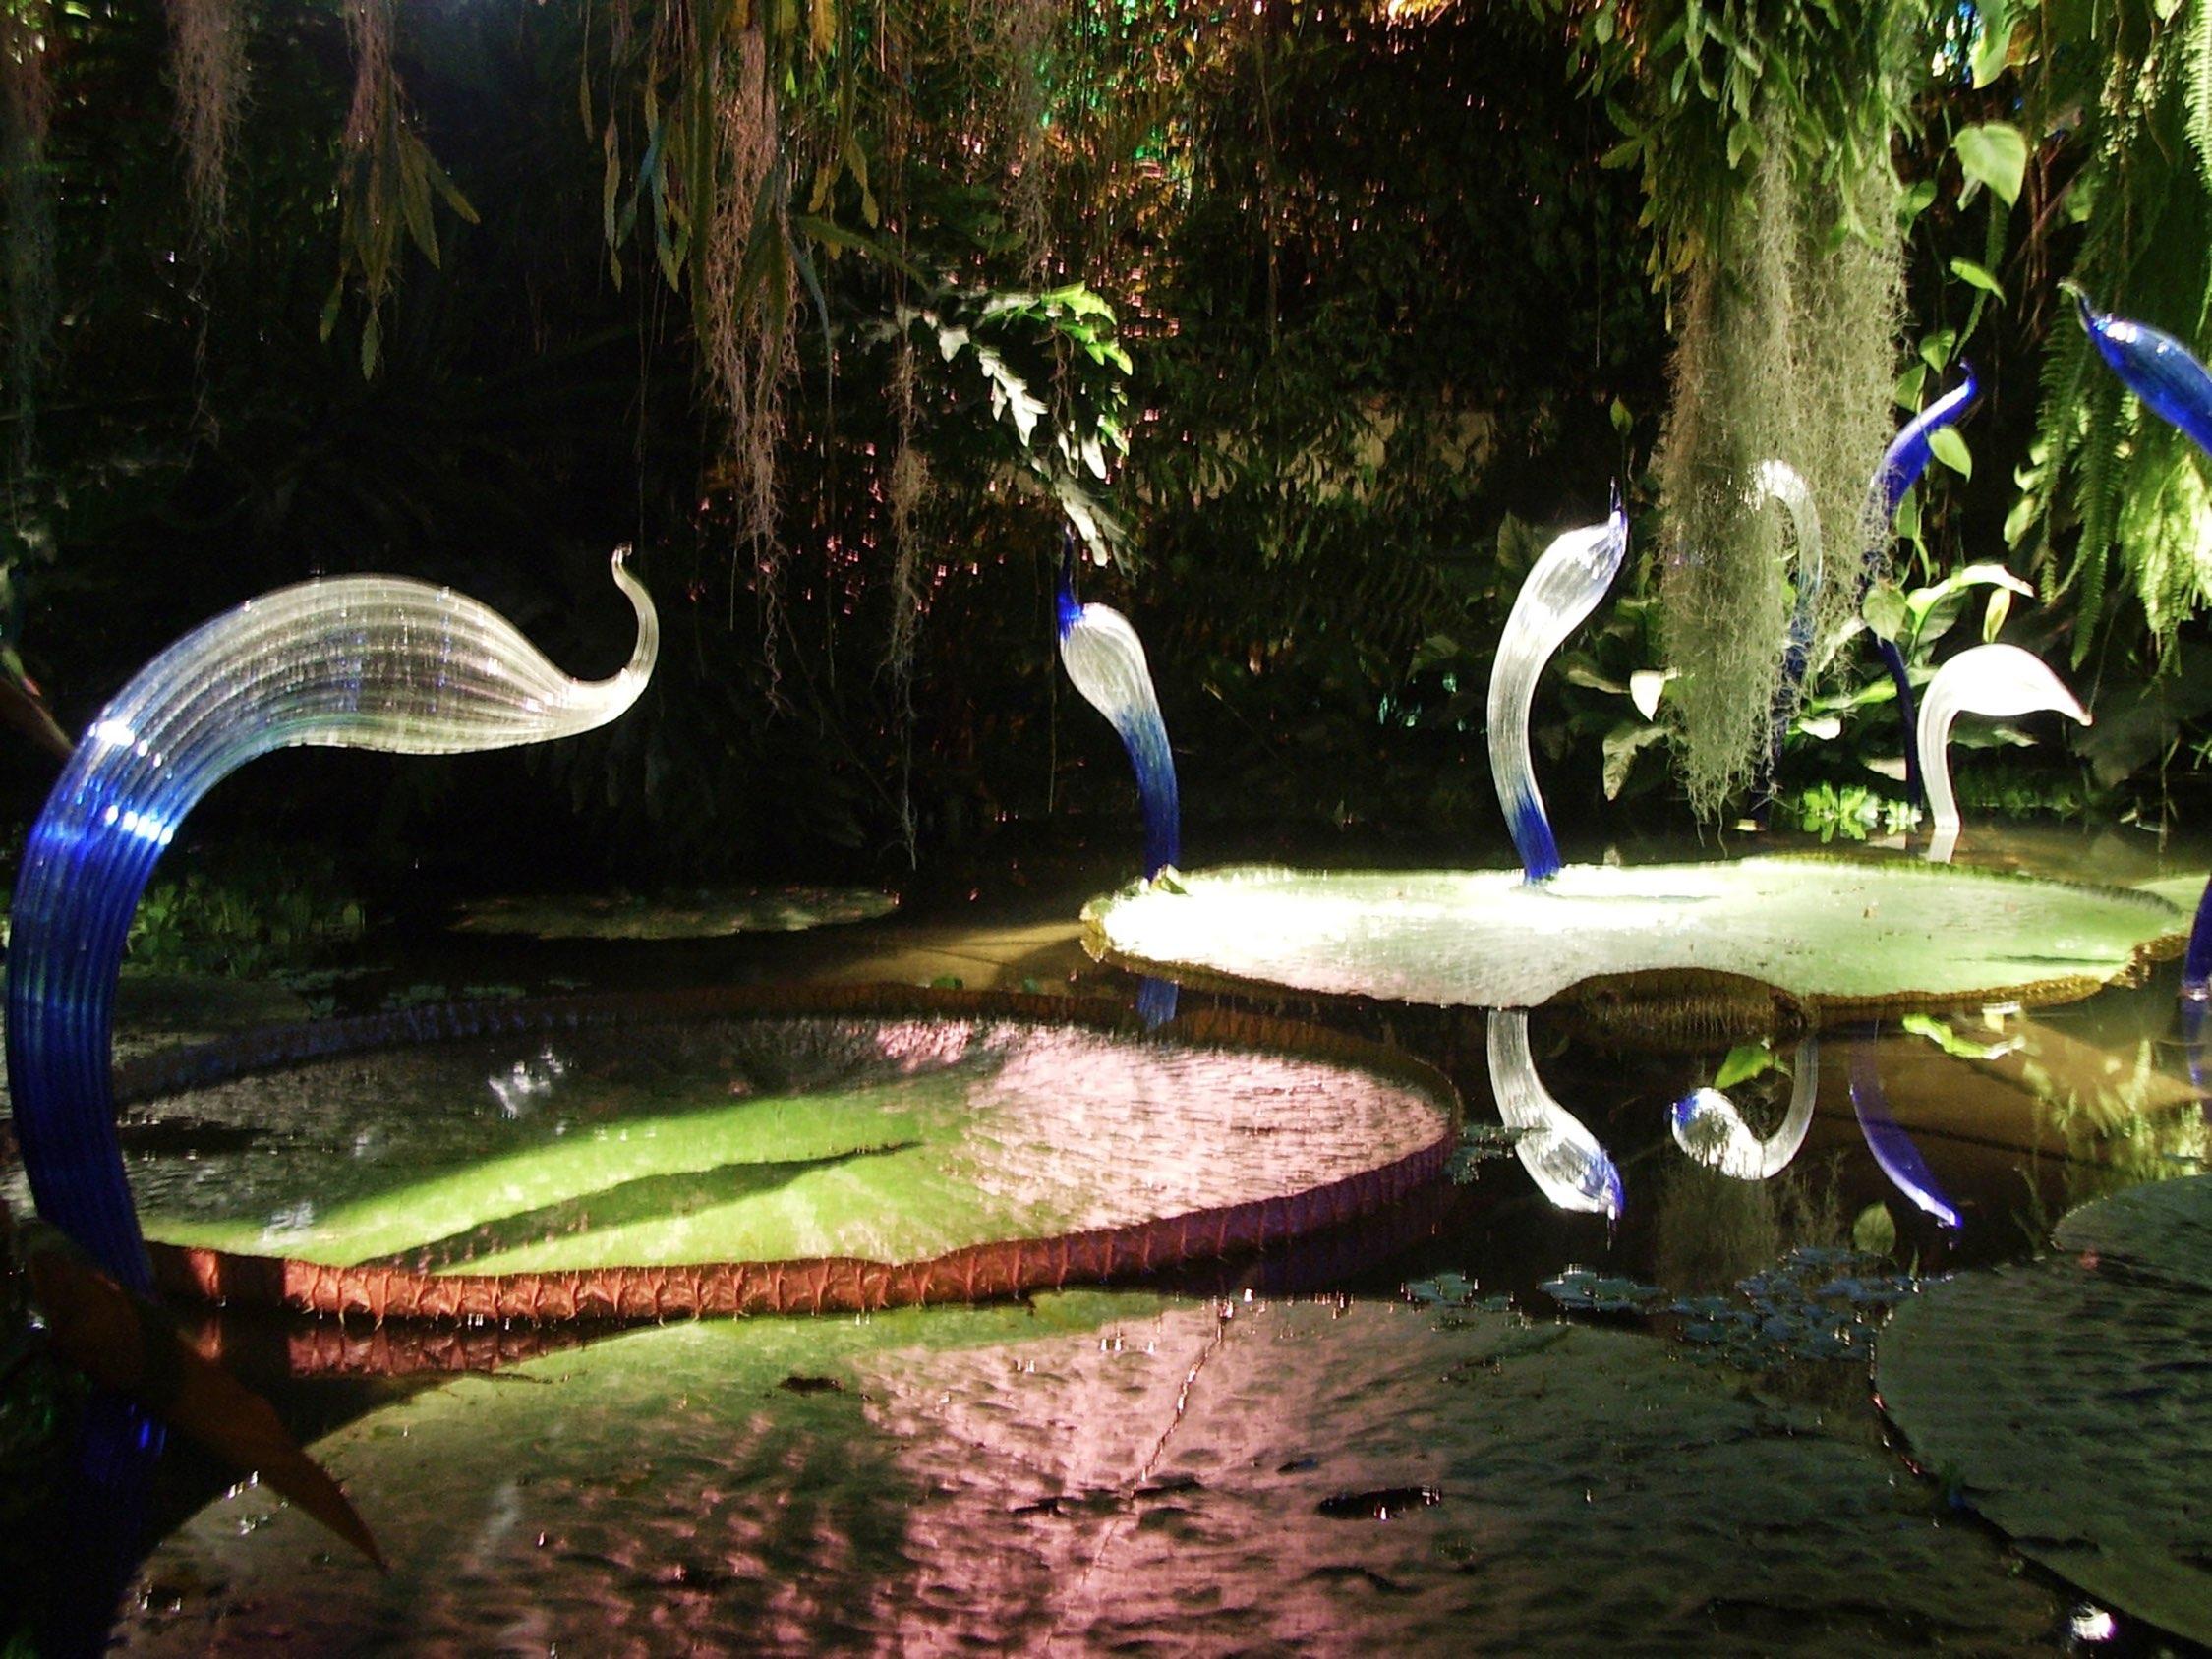 Royal-Botanical-Gardens-Studio-LUX-4